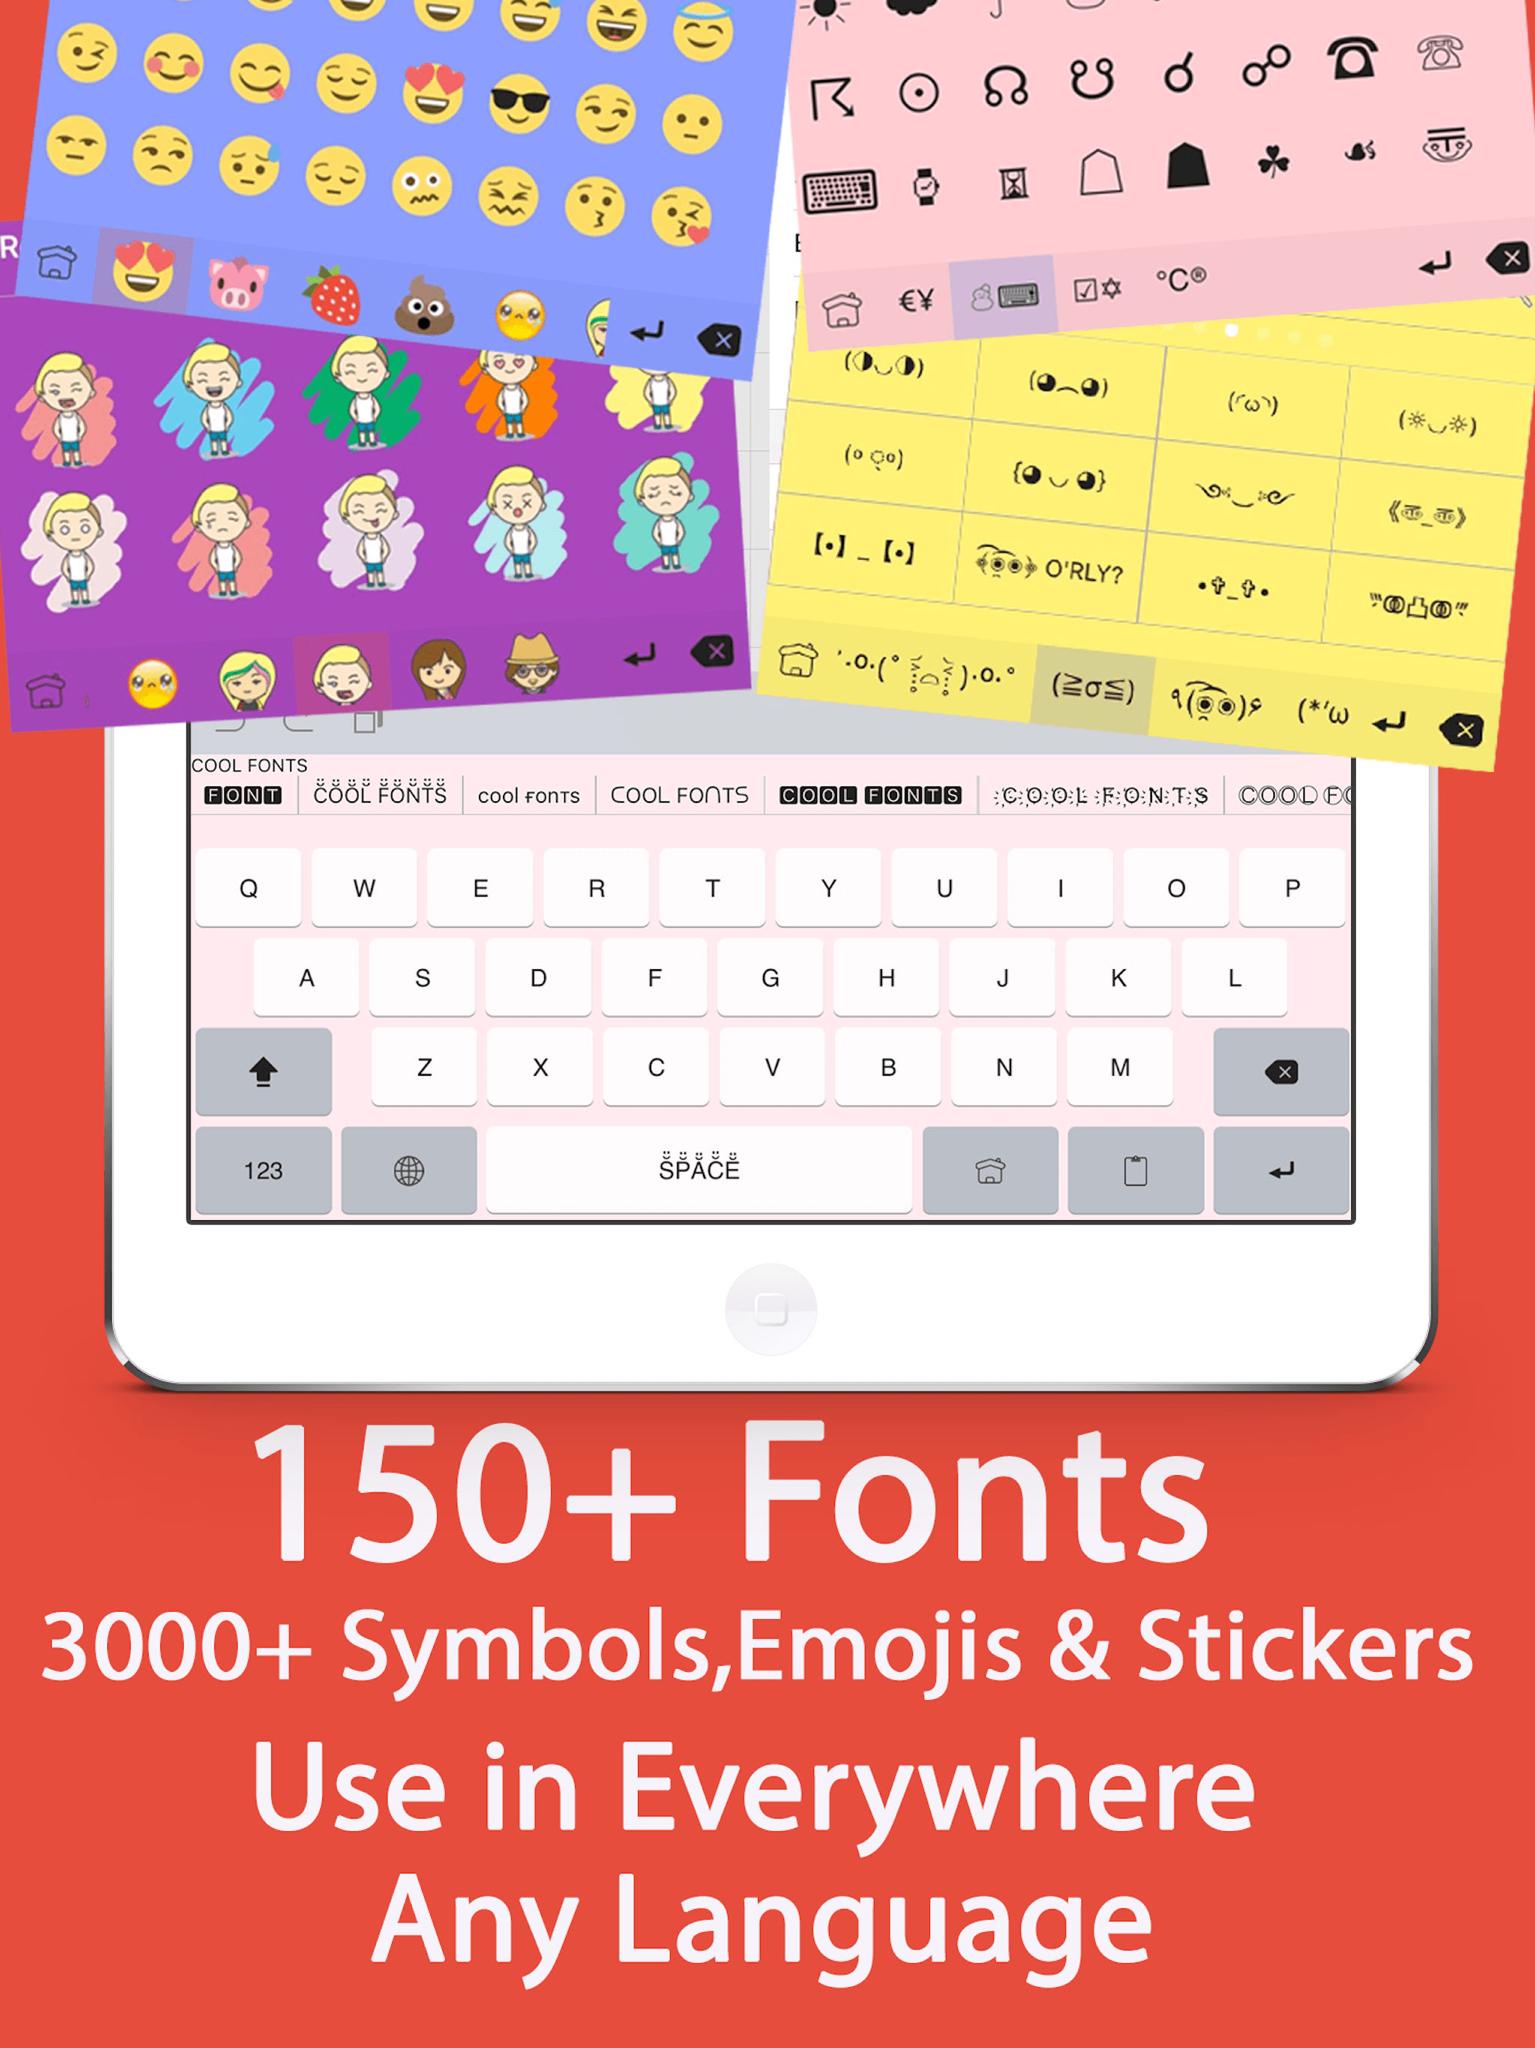 Texting language symbols gallery symbol and sign ideas texting language symbols gallery symbol and sign ideas symbol infinity keyboard for emoji text symbols app biocorpaavc